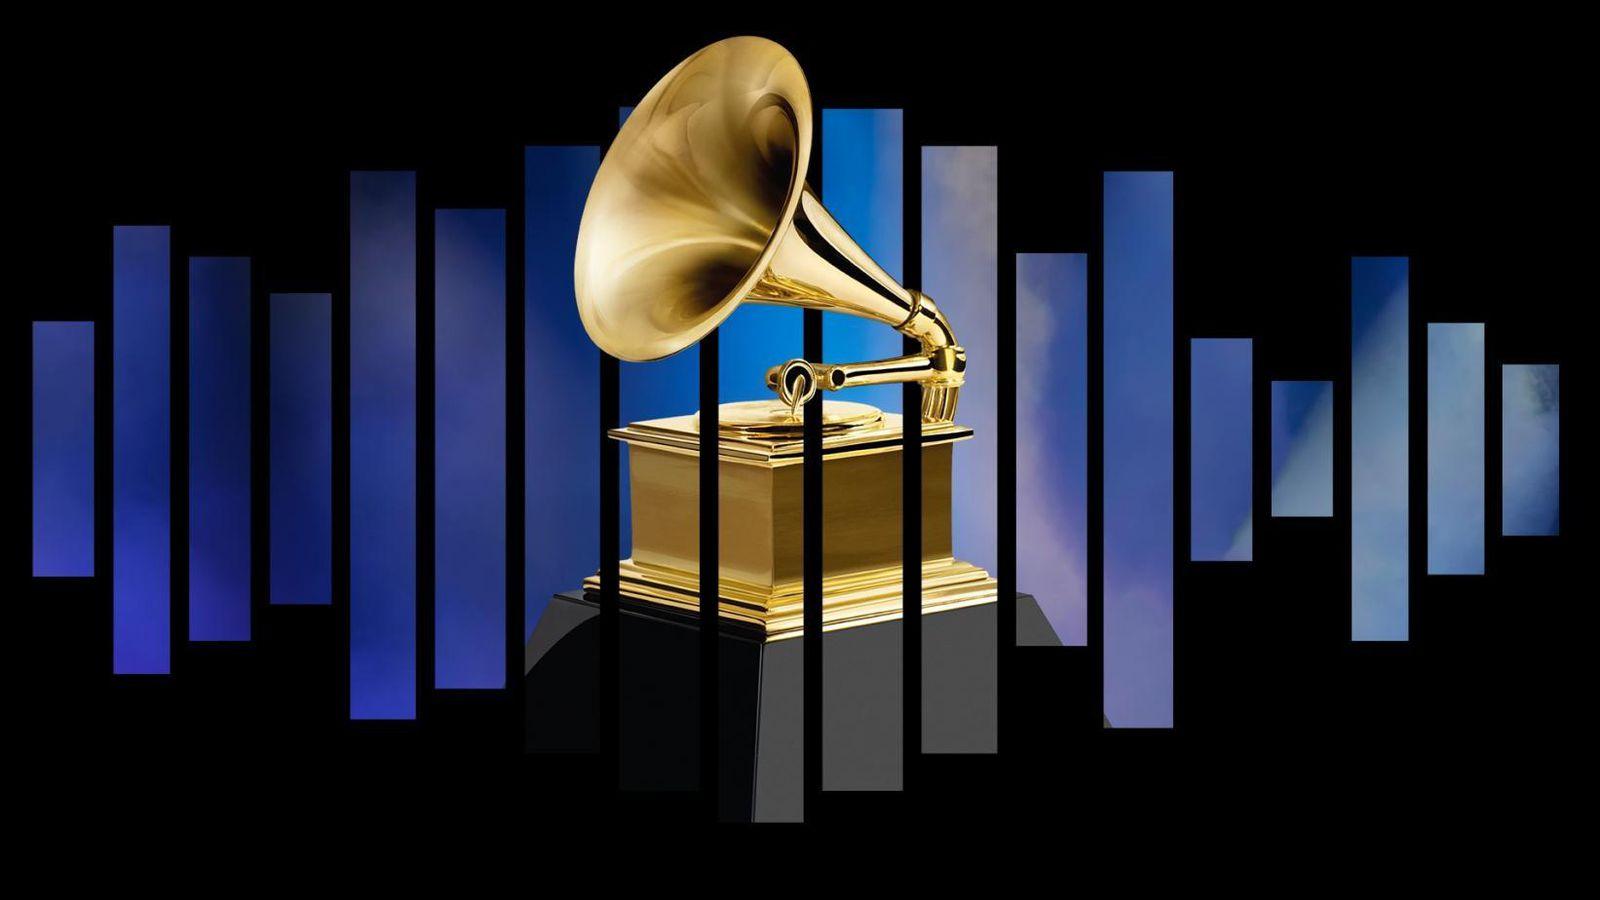 Grammy Winner Alicia Keys to Return as 2020 Grammy Awards Host 1600x900